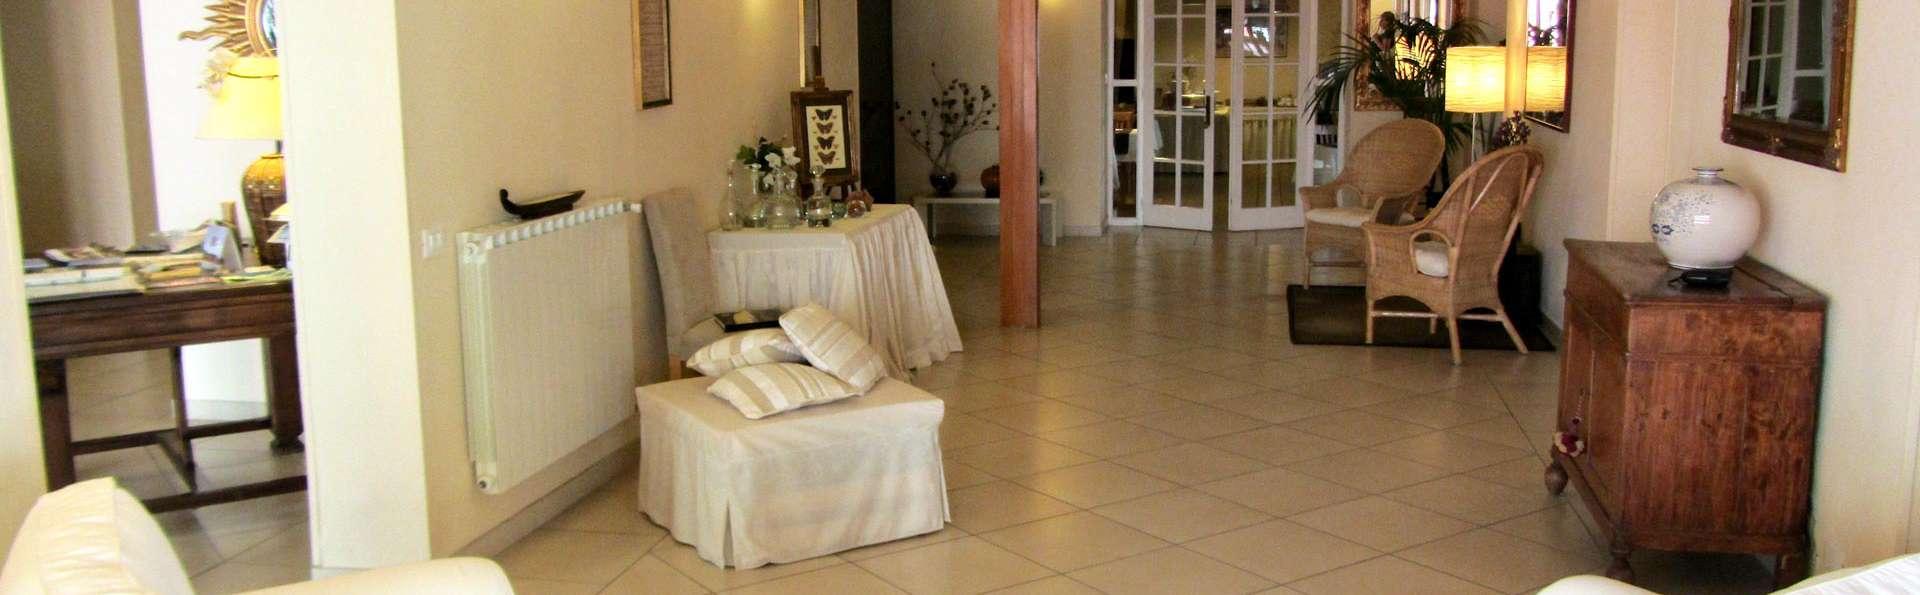 Hotel Ausonia - EDIT_HALL_01.jpg